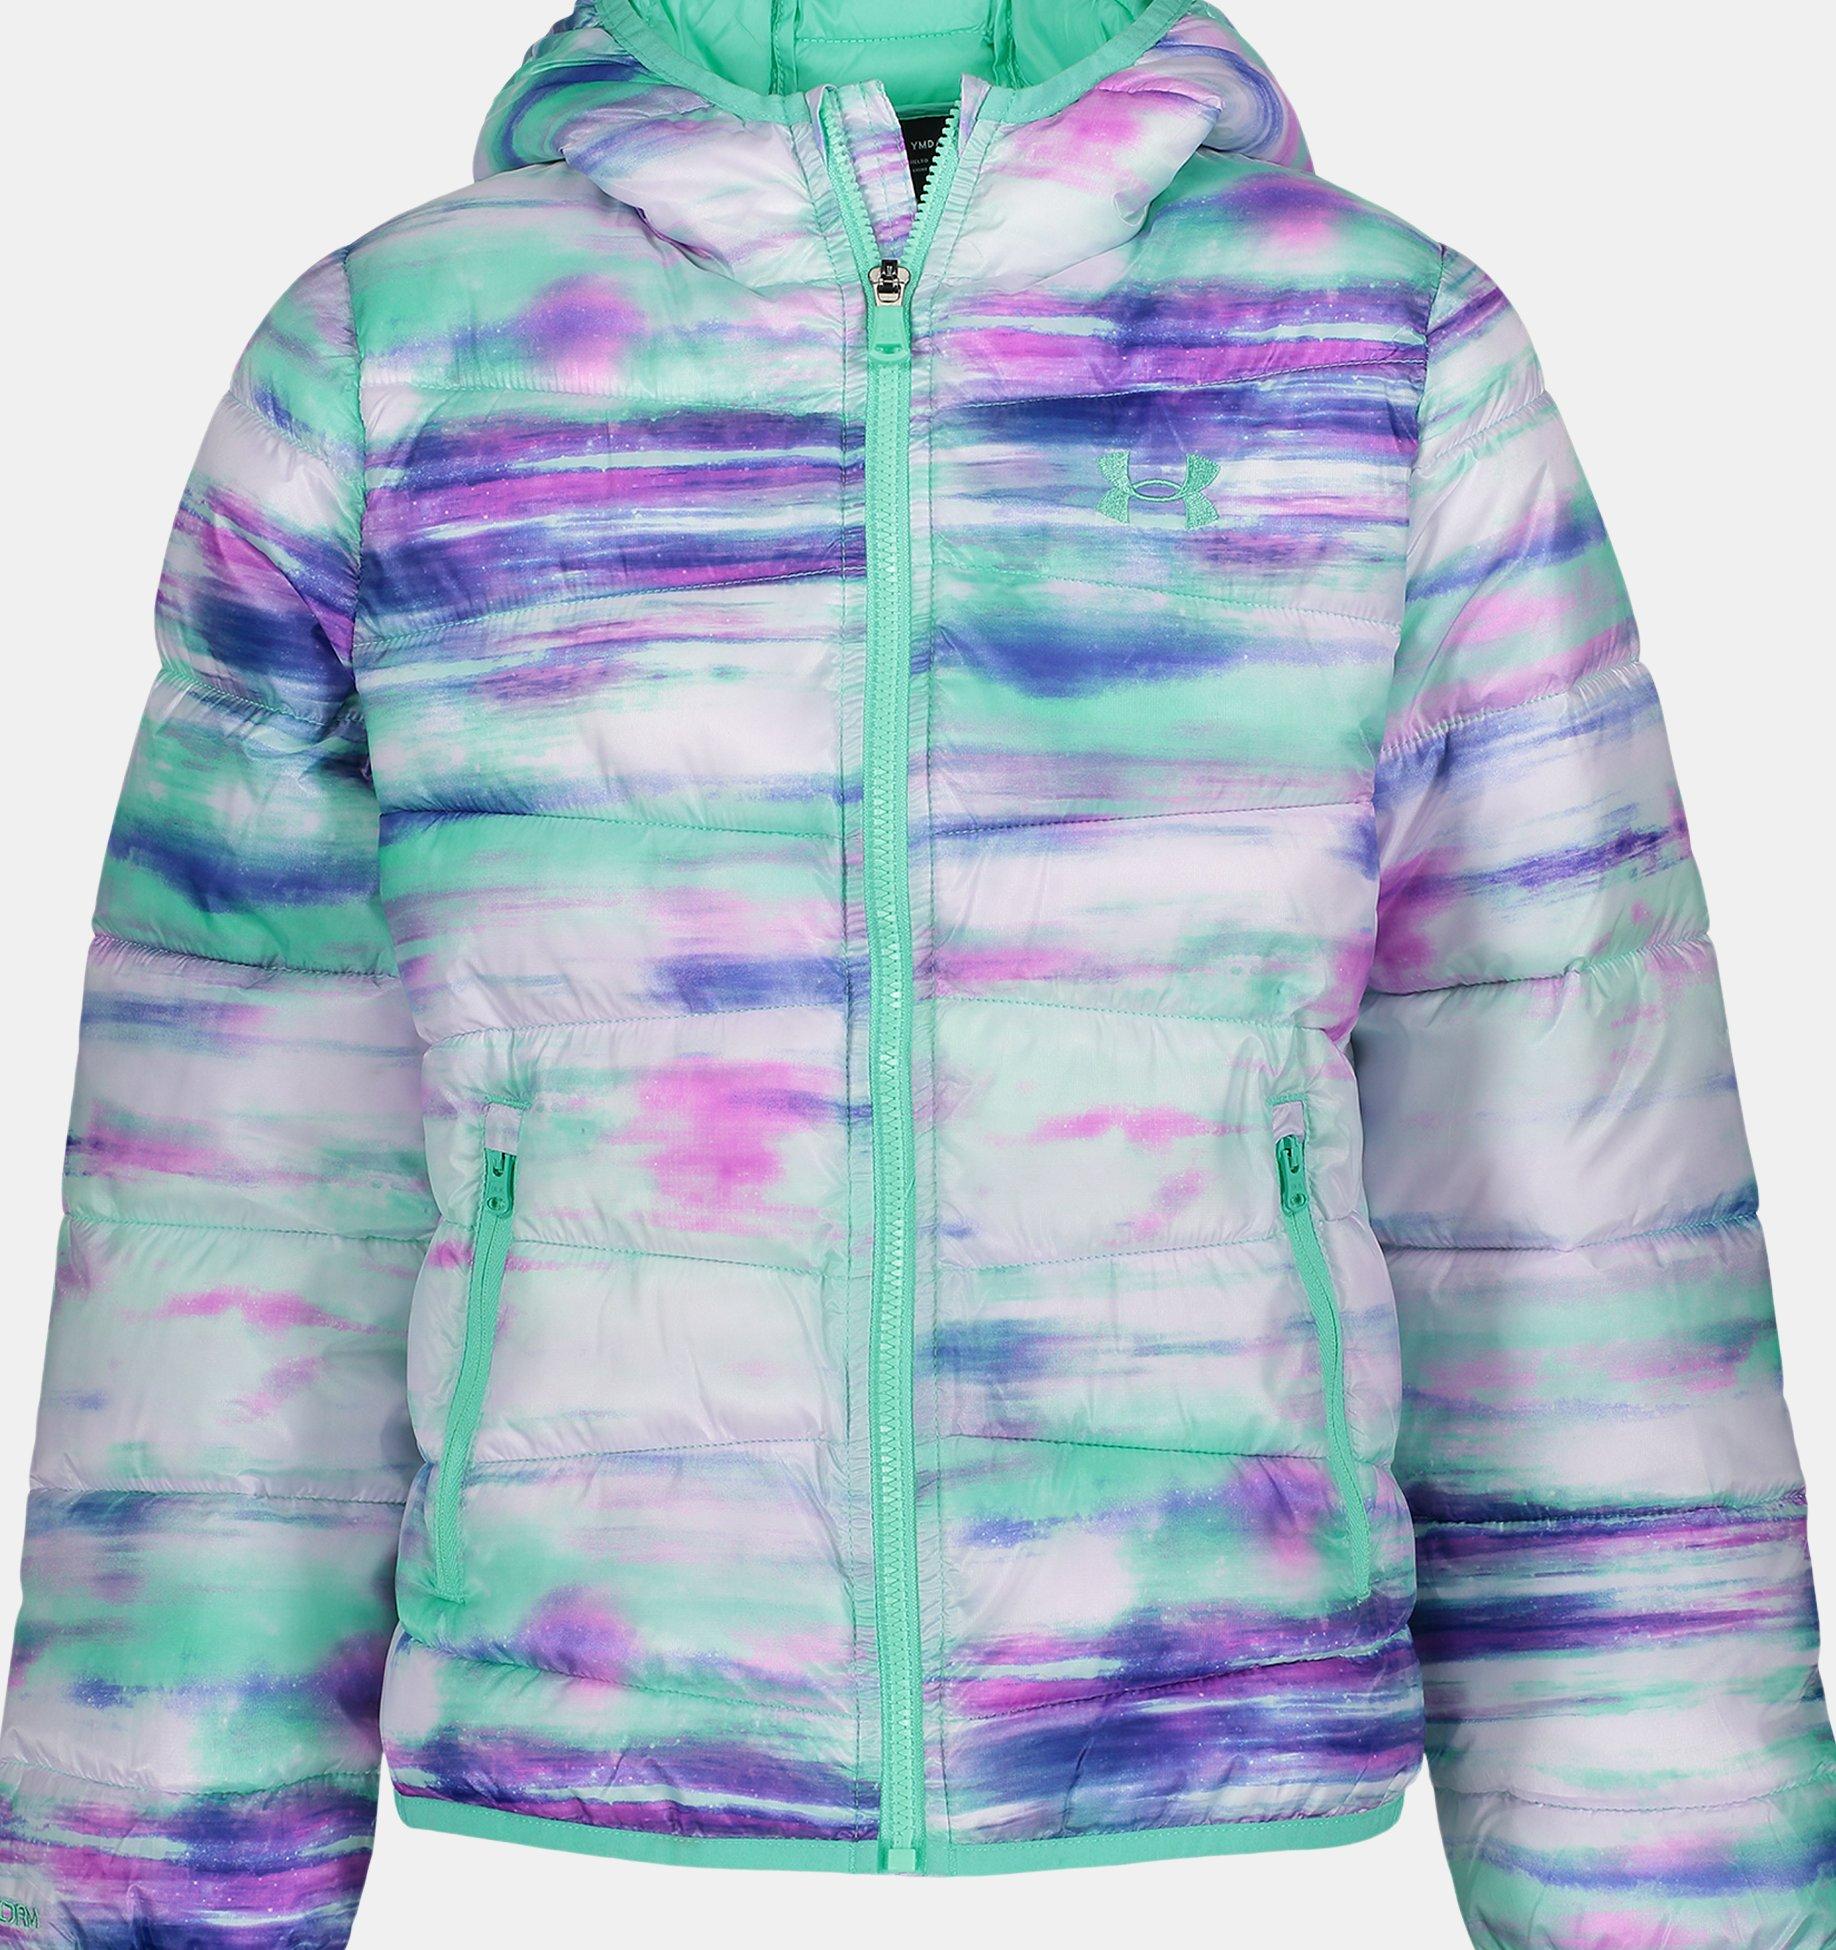 Underarmour Girls UA Print Prime Puffer Jacket